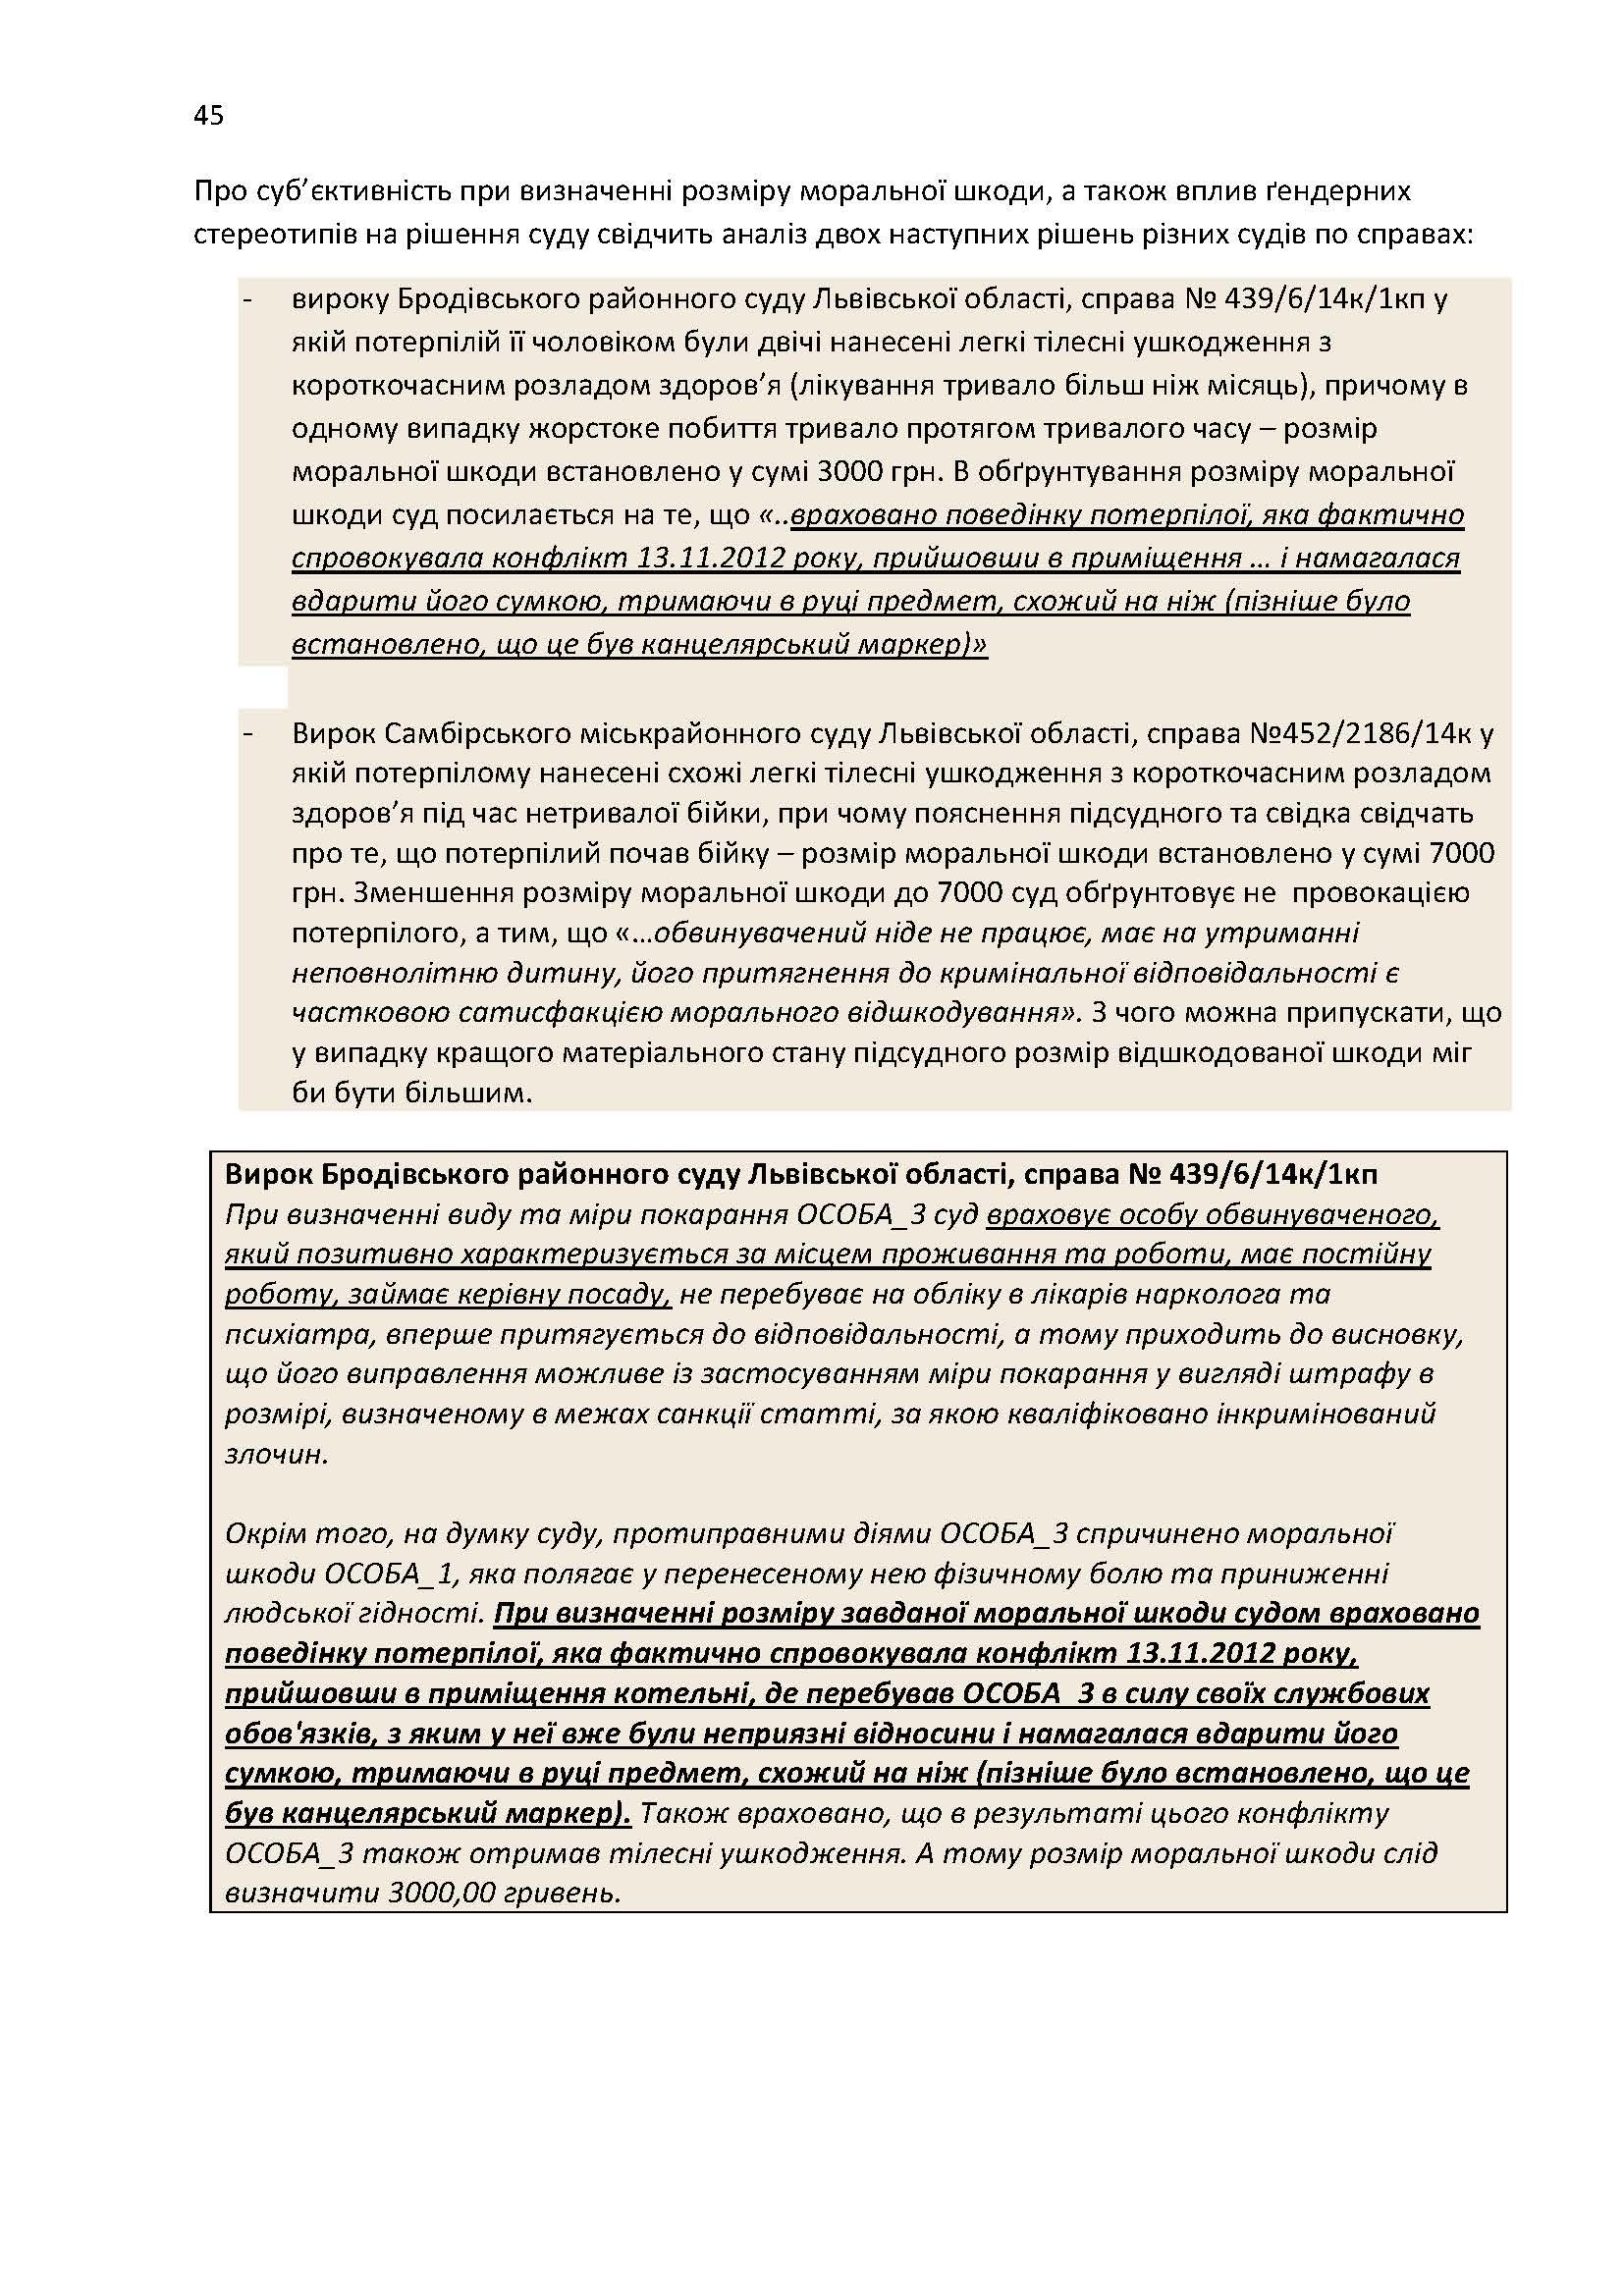 Draft Report monitoring print USAID_Страница_45